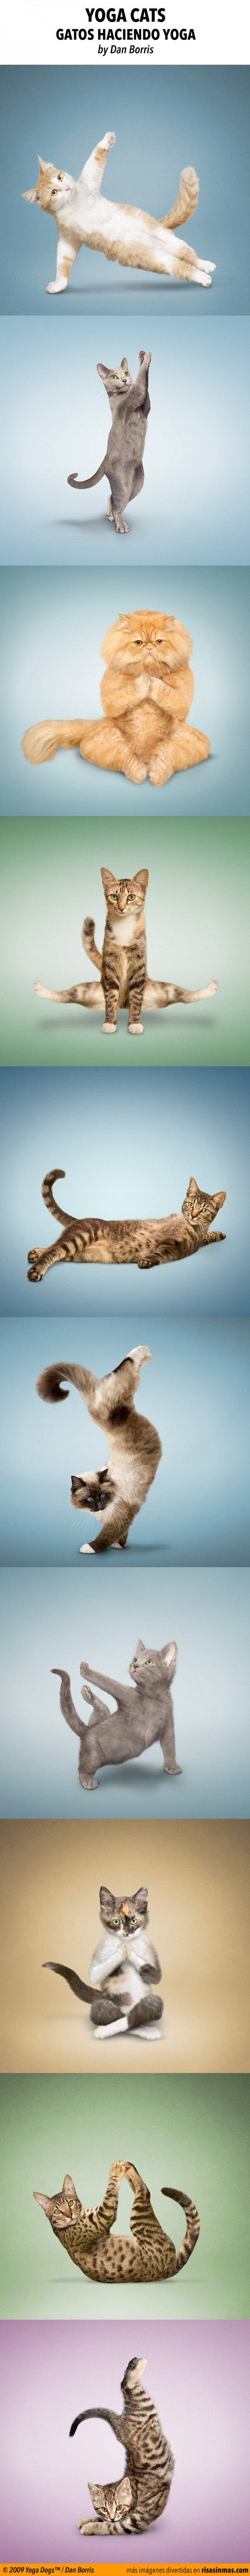 Yoga cats, gatos haciendo yoga